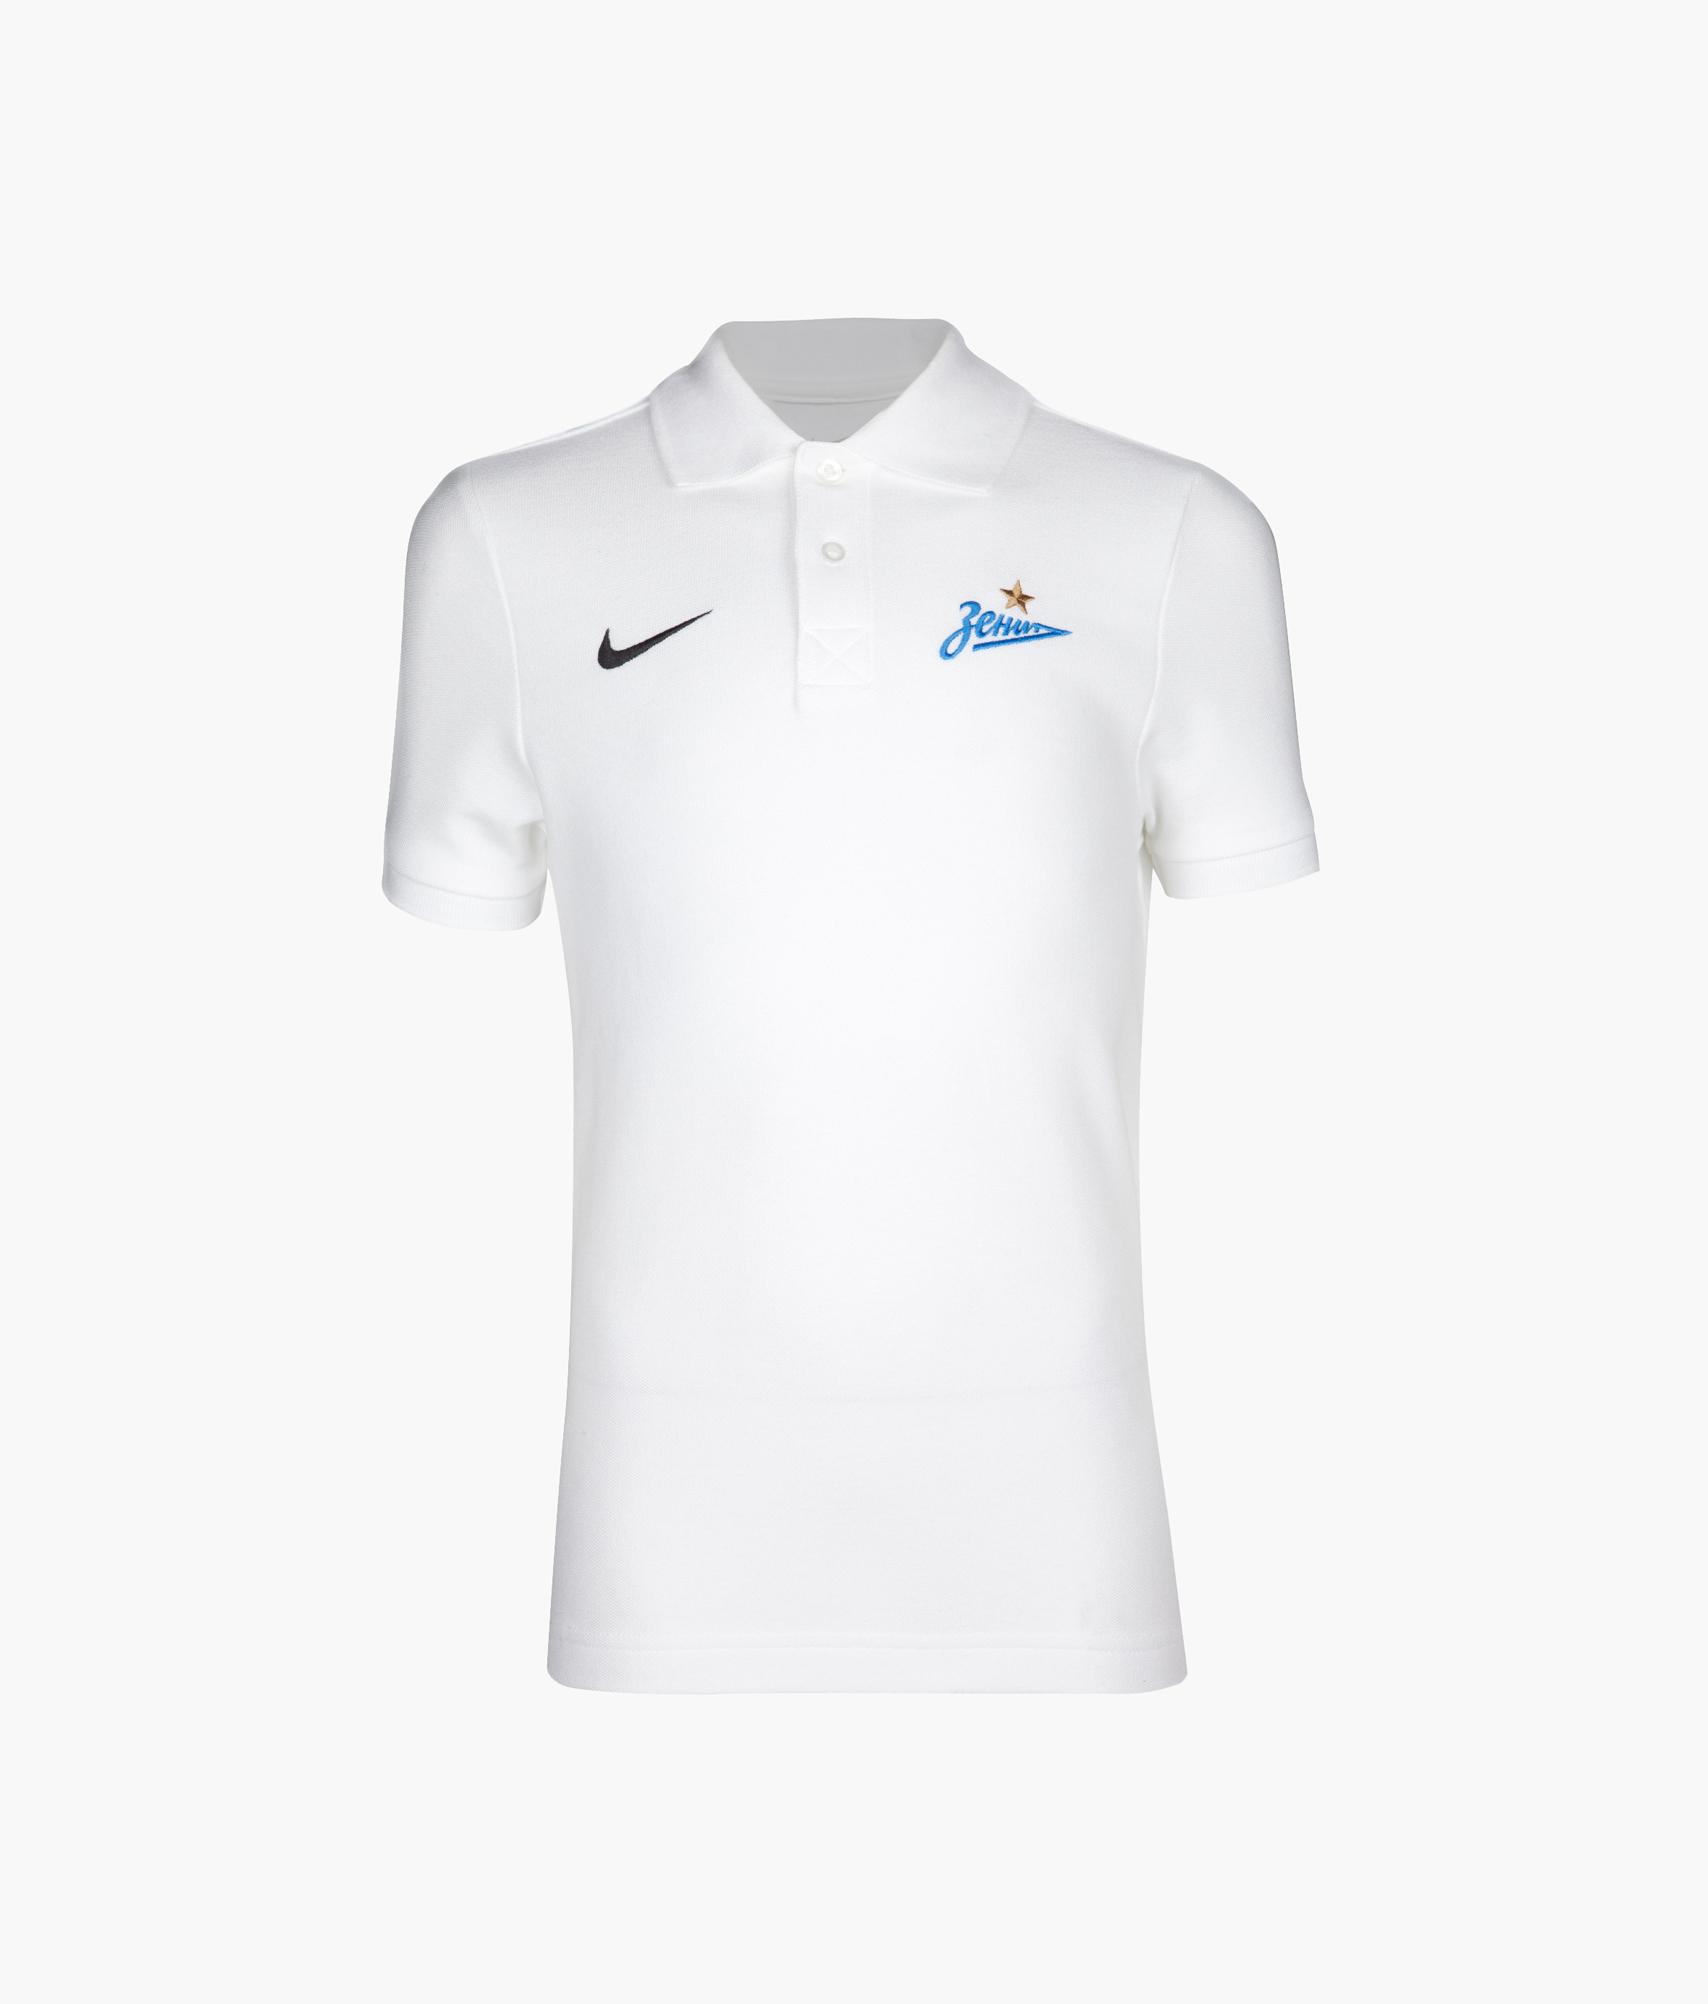 Поло подростковое Nike, Цвет-Белый, Размер-XS поло nike цвет голубой размер m